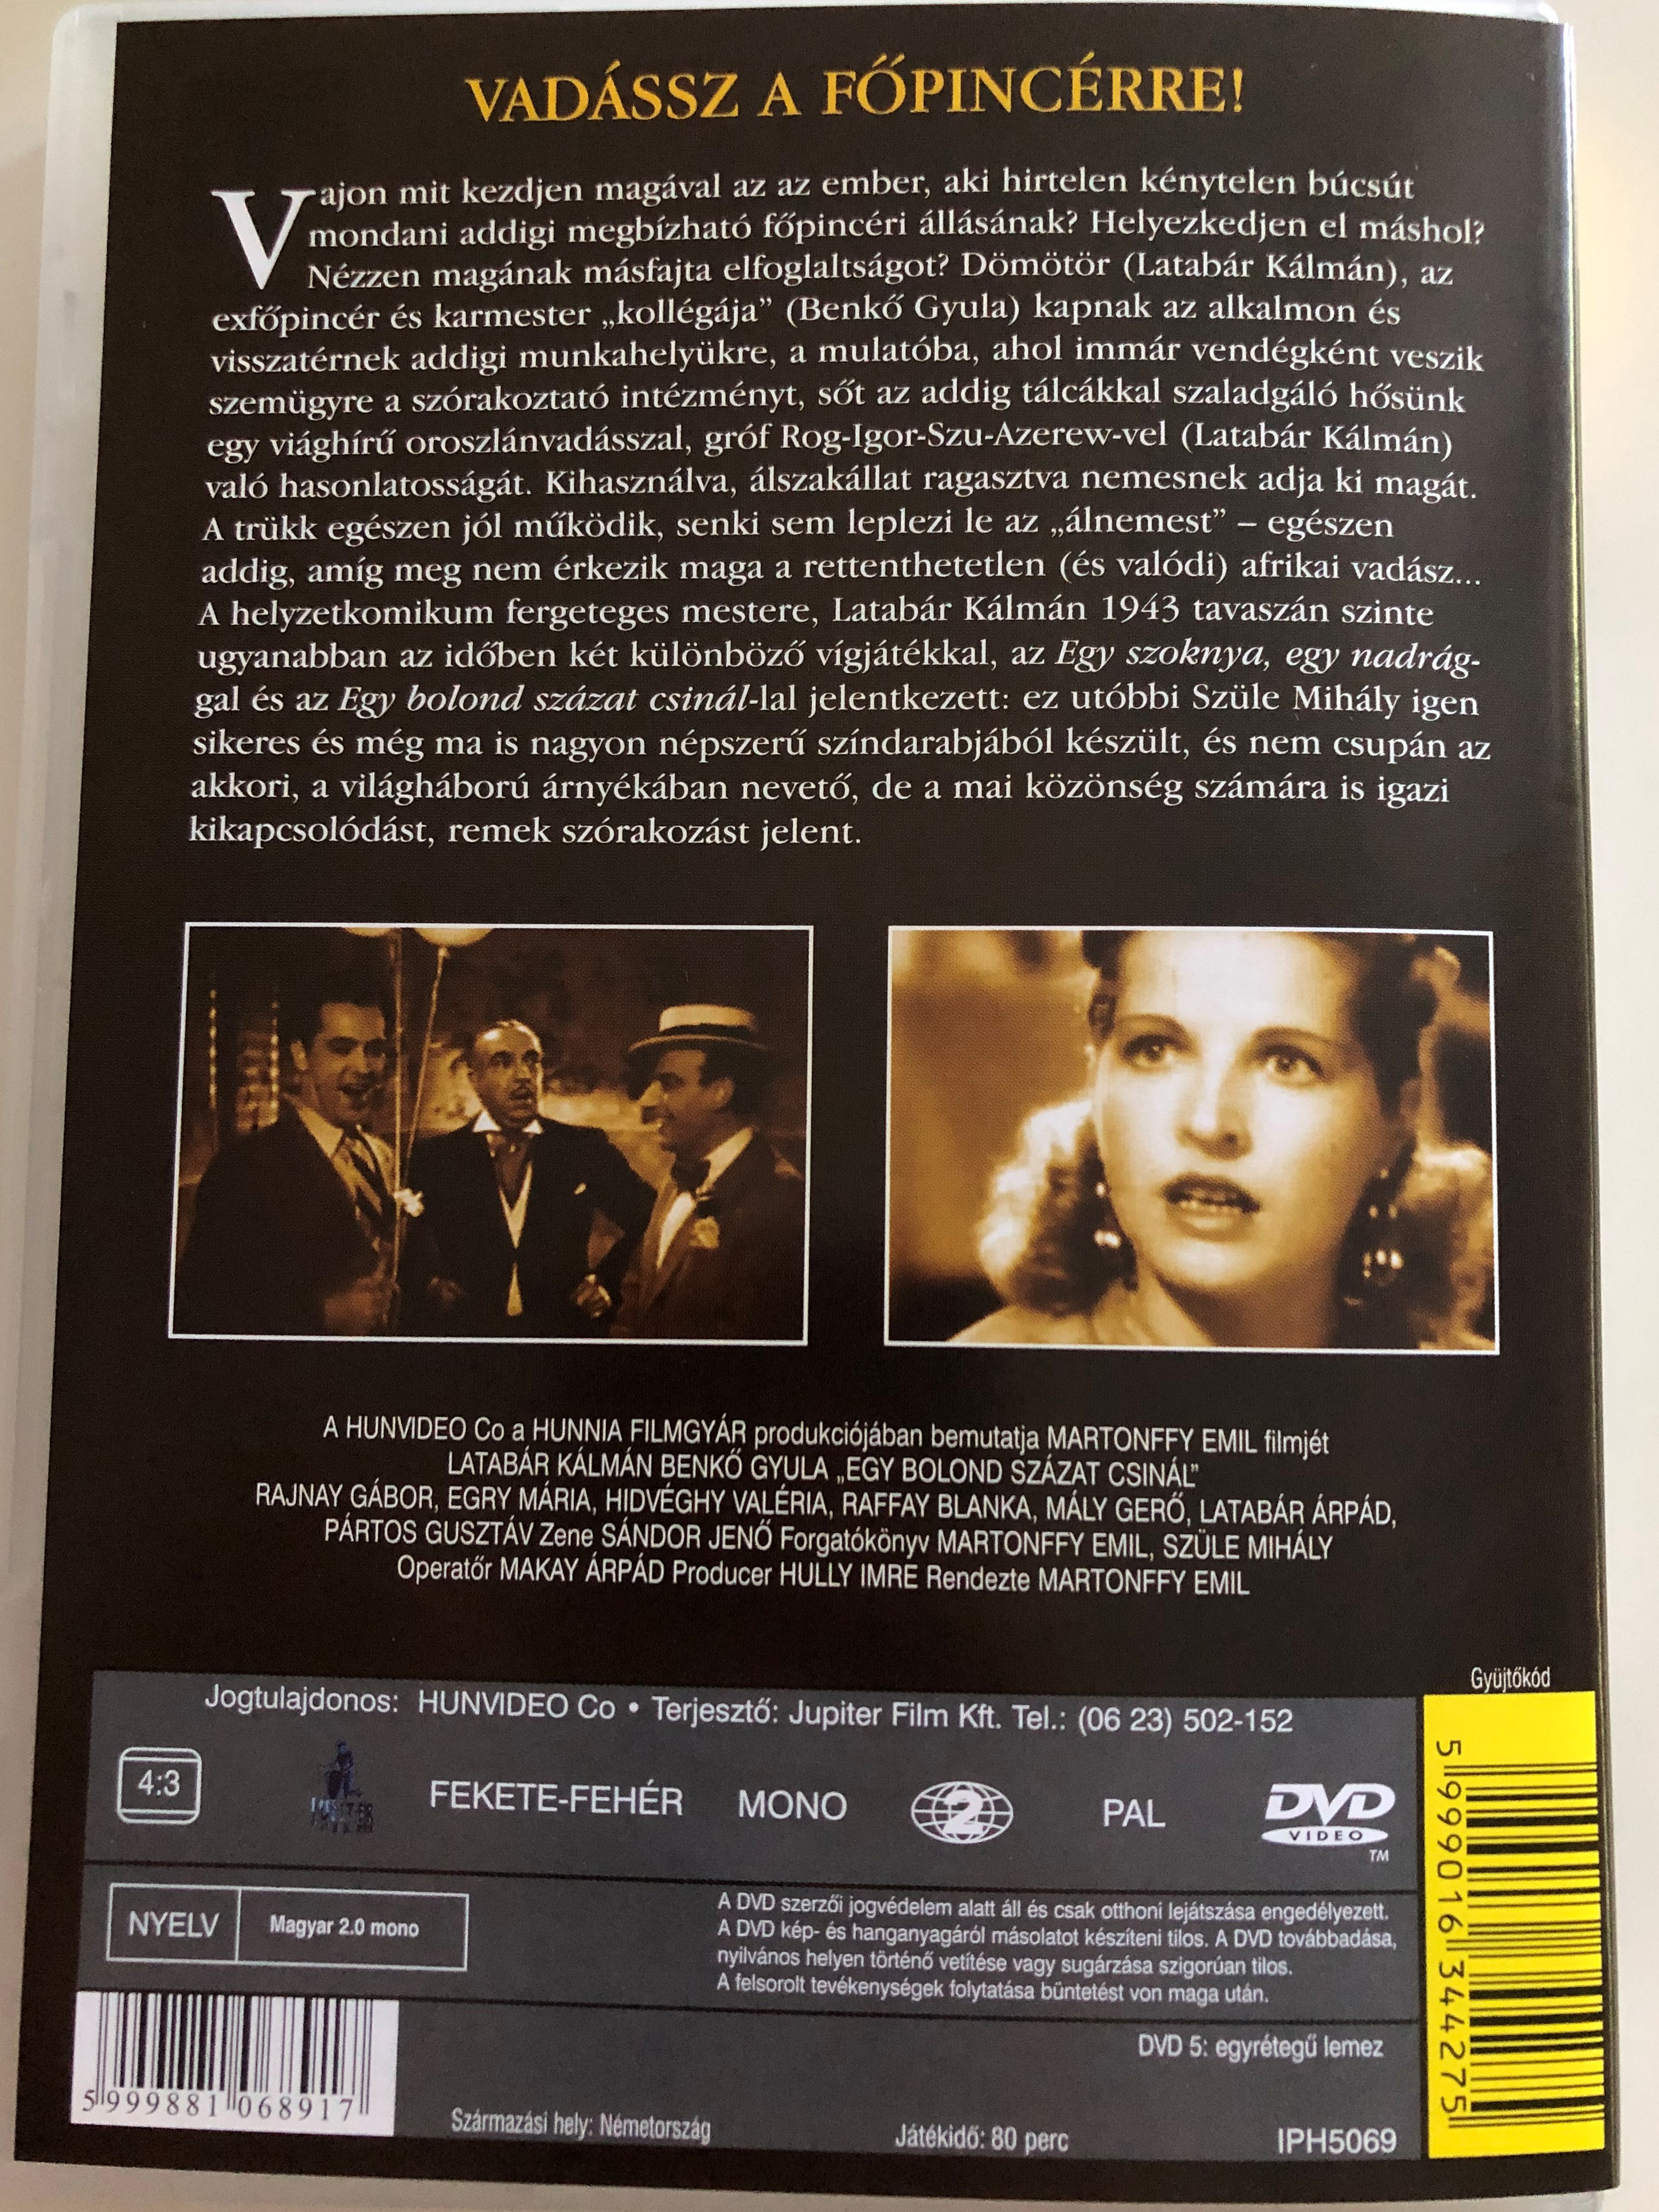 egy-bolond-sz-zat-csin-l-dvd-1942-directed-by-martonffy-emil-starring-latab-r-k-lm-n-benk-gyula-magyar-klasszikusok-6.-hungarian-classic-b-w-film-2-.jpg